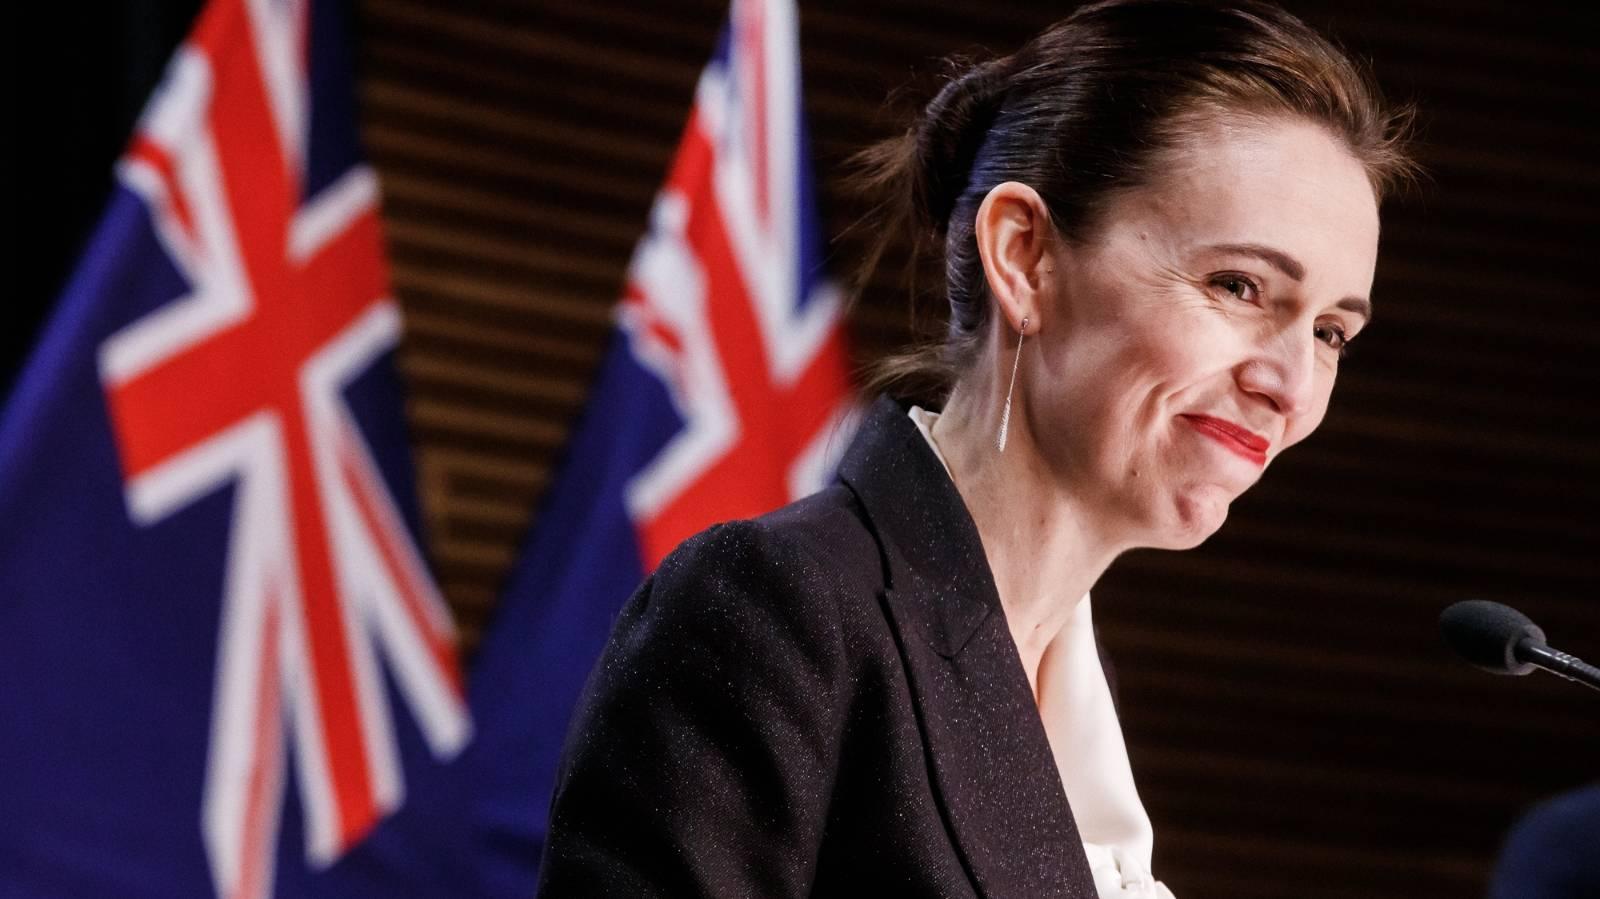 Distance between NZ and allies grows